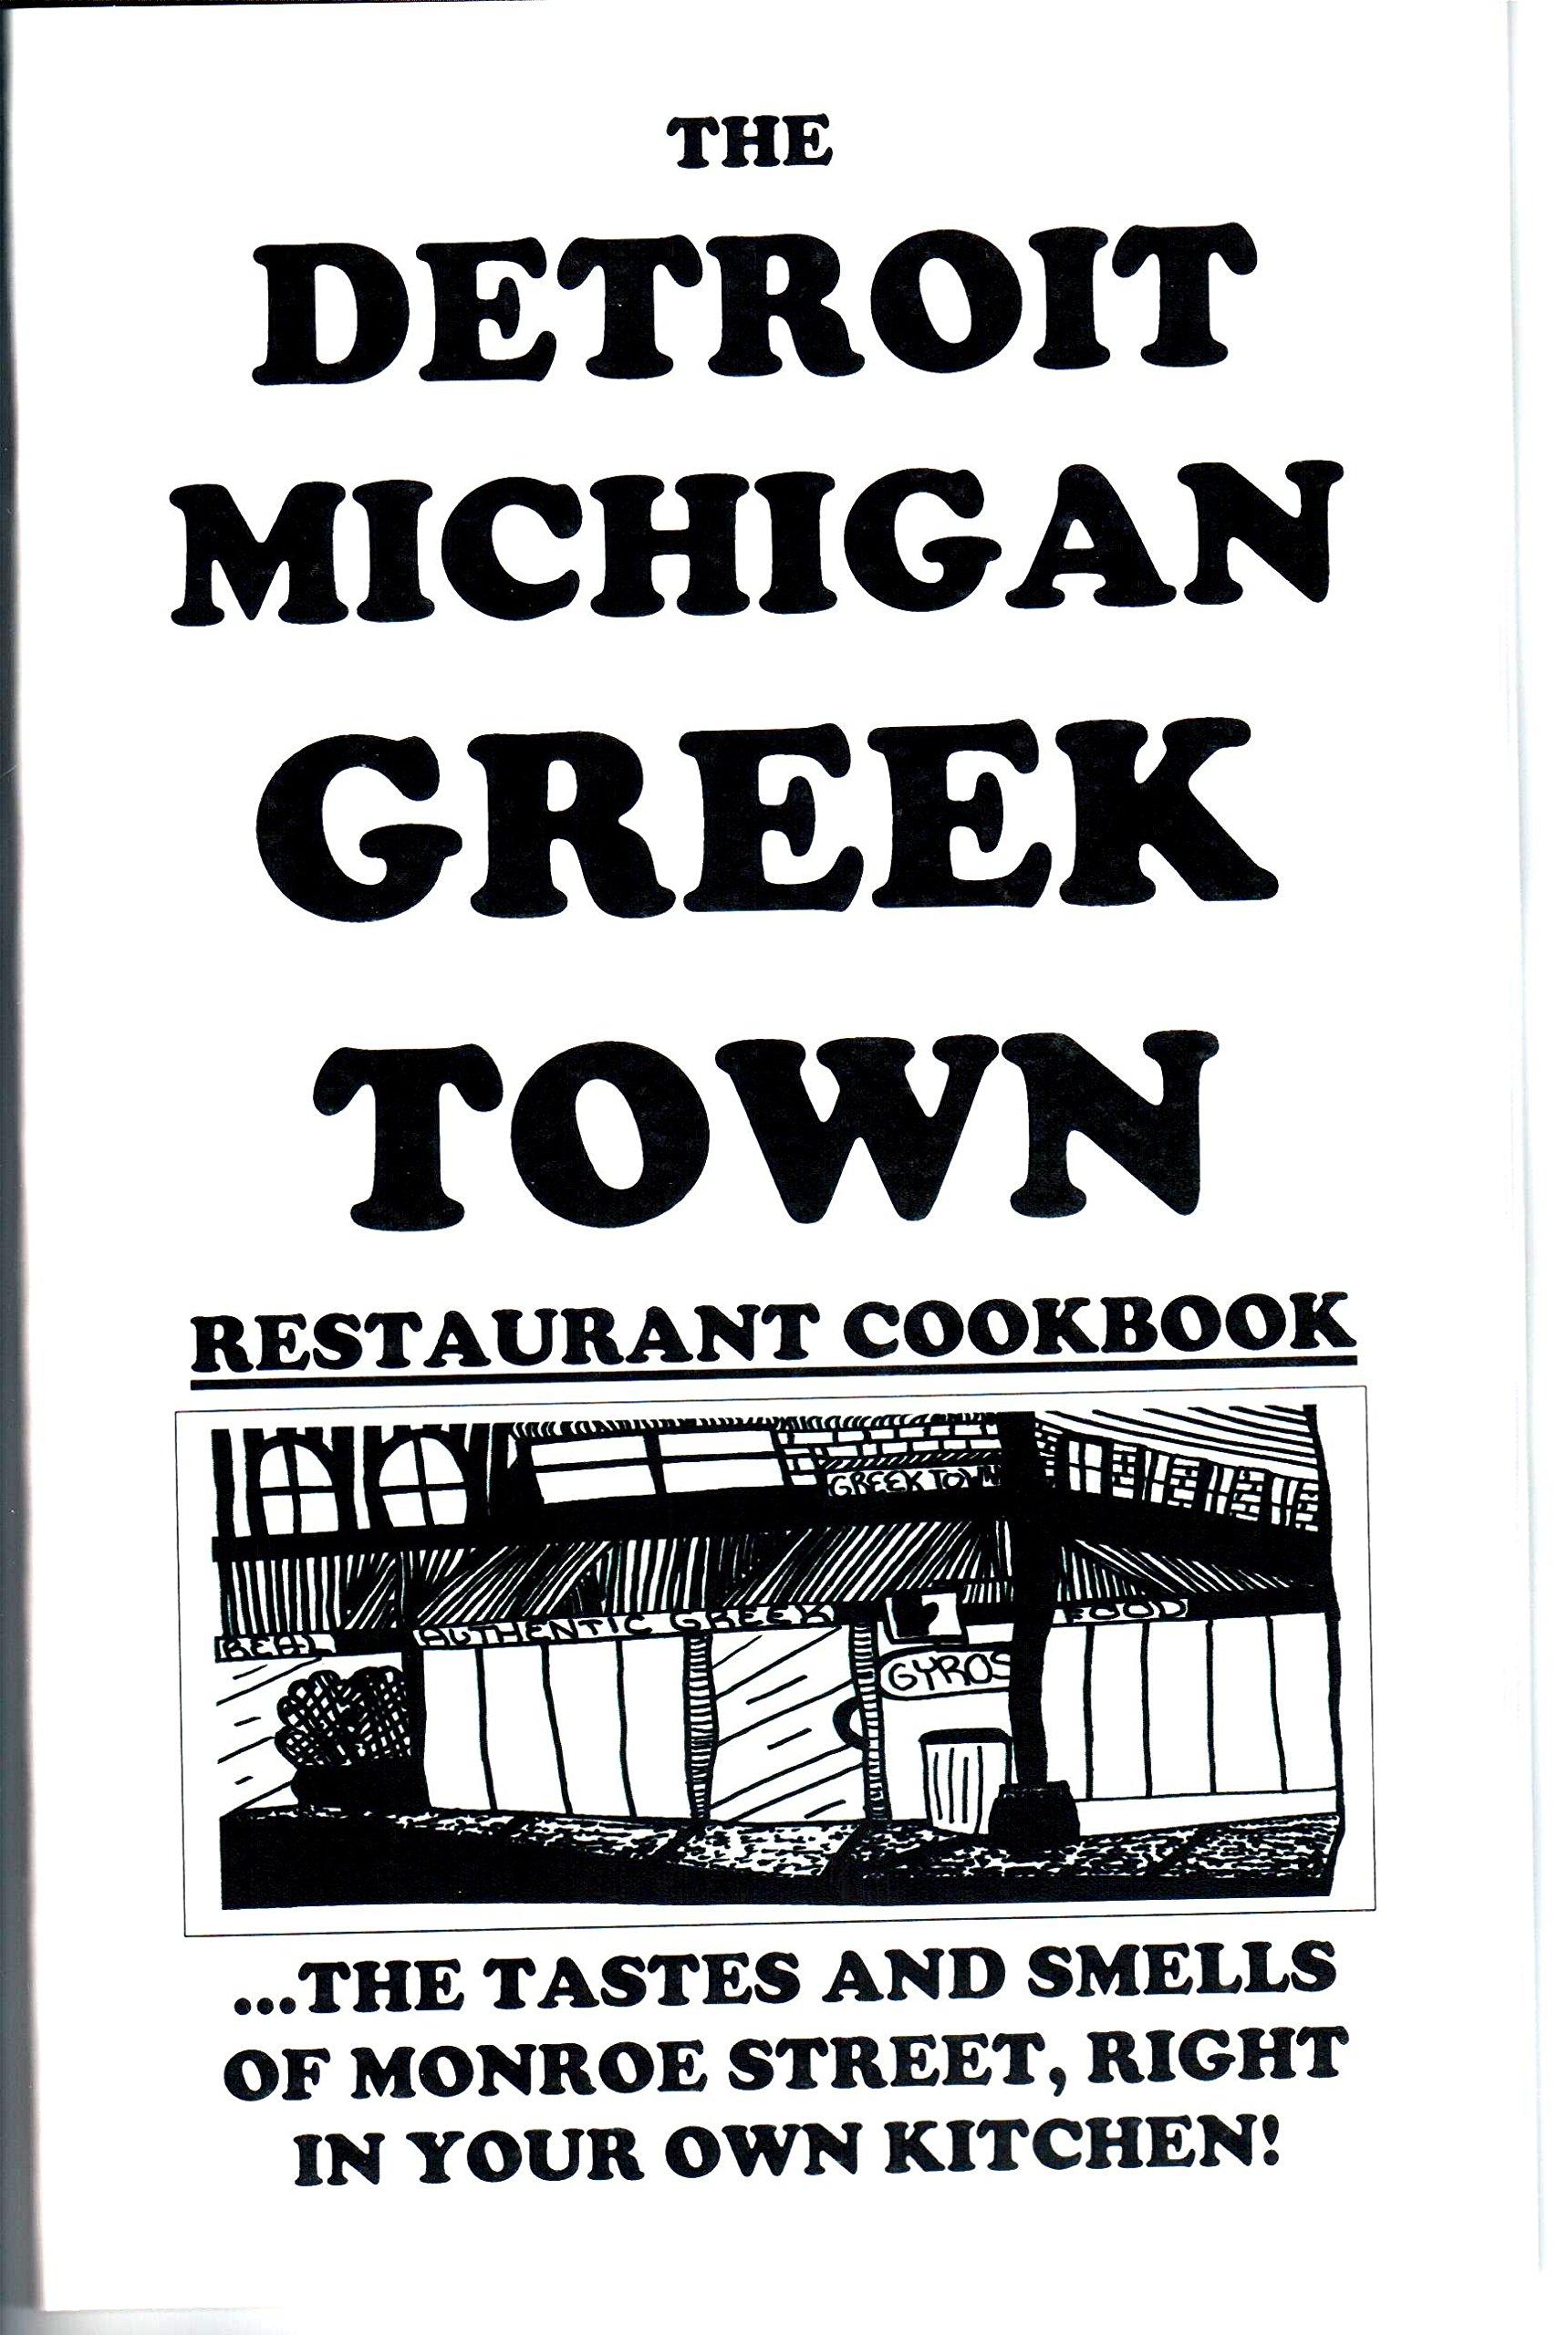 The Detroit Michigan Greek Town Restaurant Cookbook (\